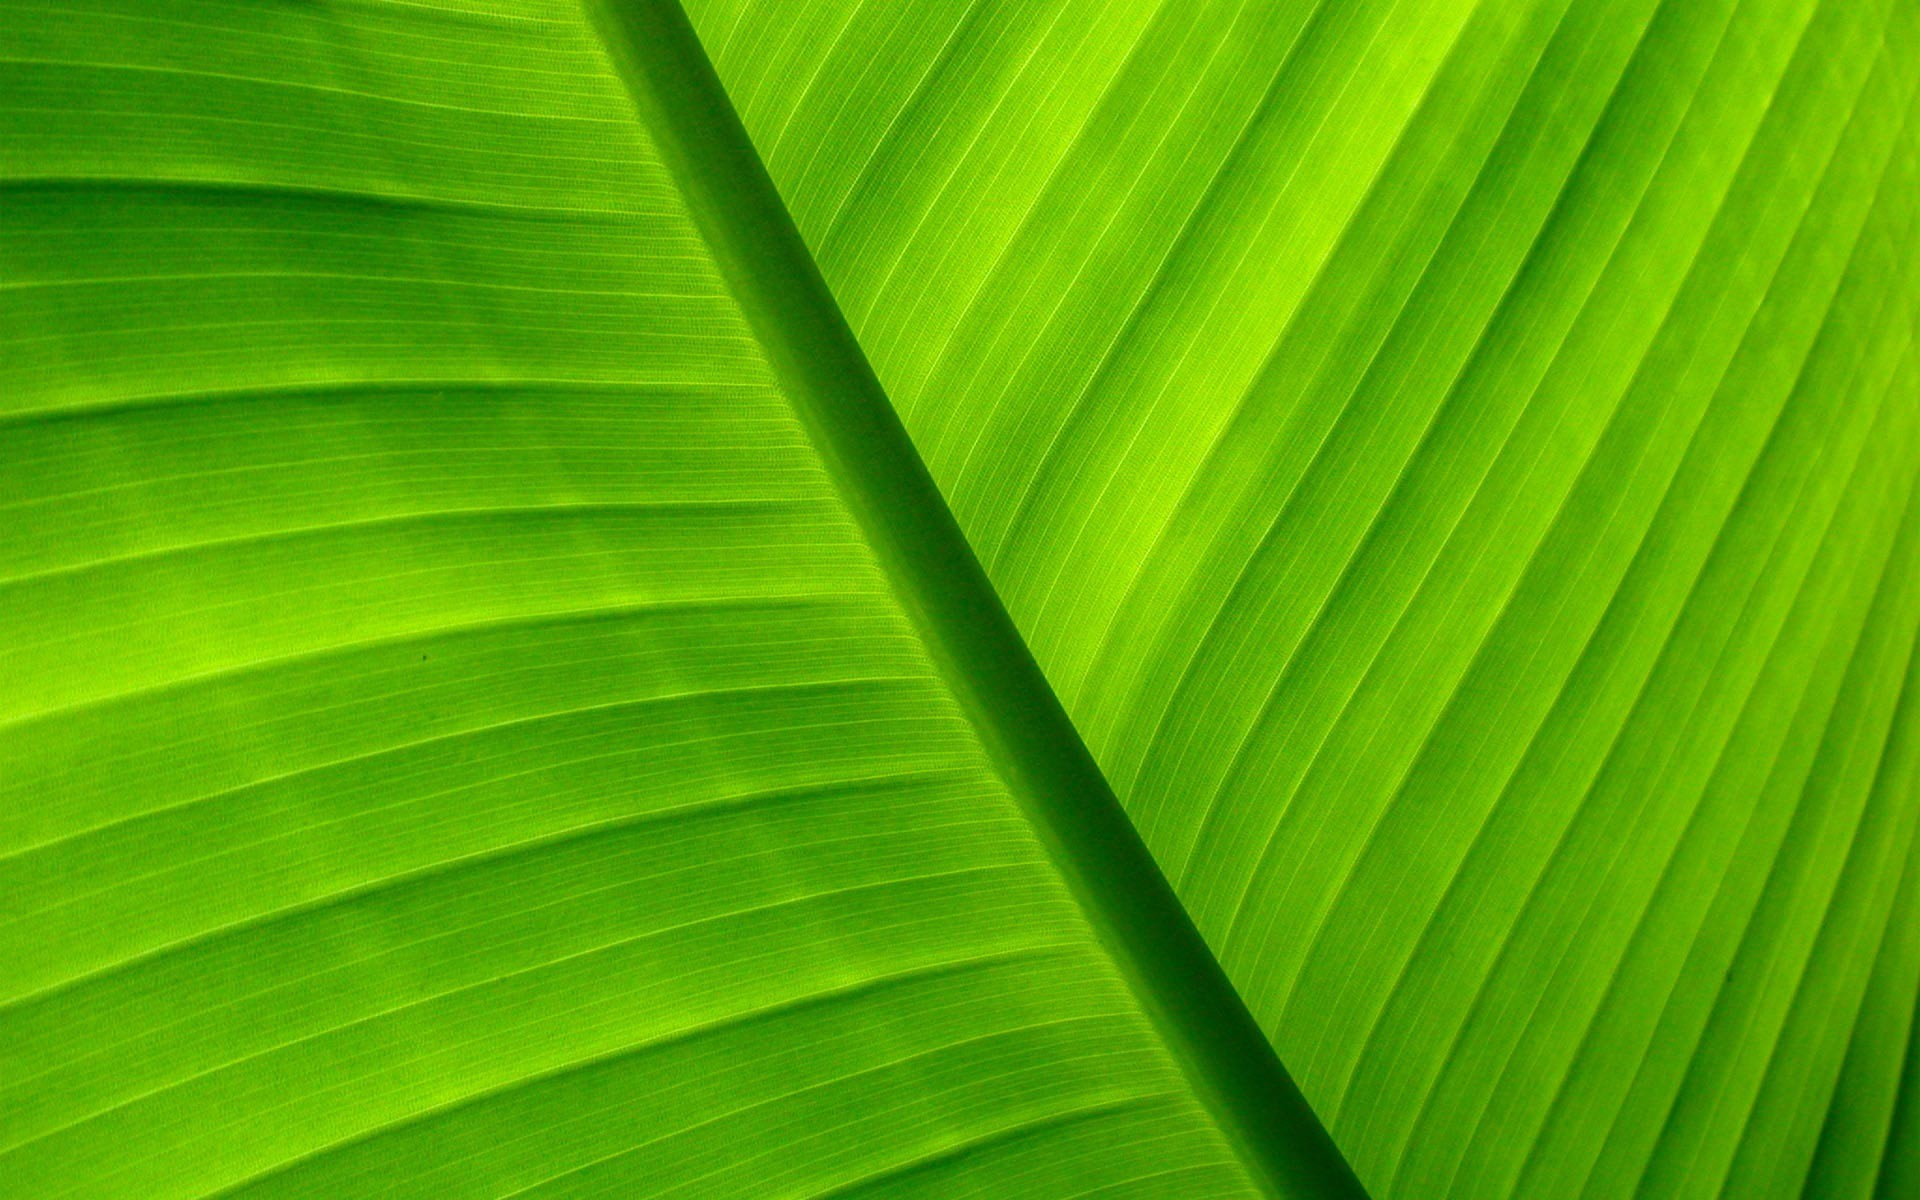 Palm leaf wallpaper 6285 1920x1200